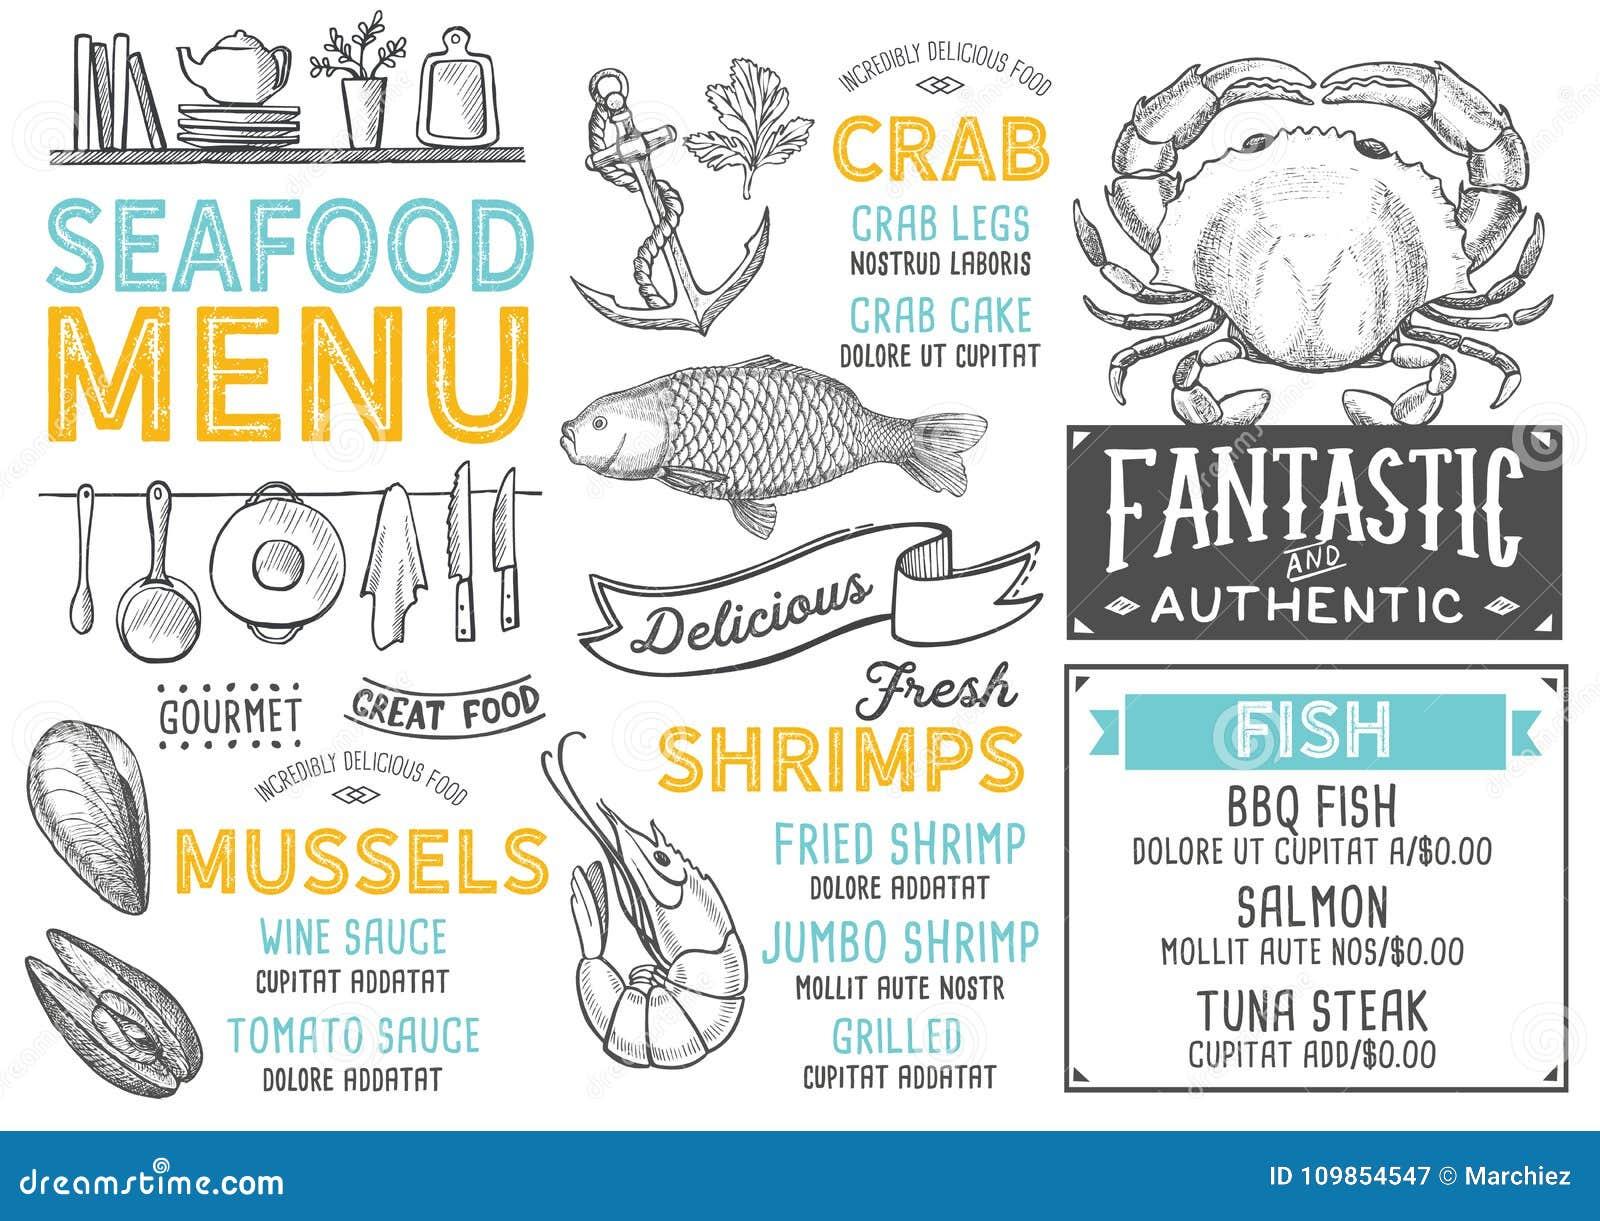 Seafood Menu Restaurant Food Template Stock Vector Illustration